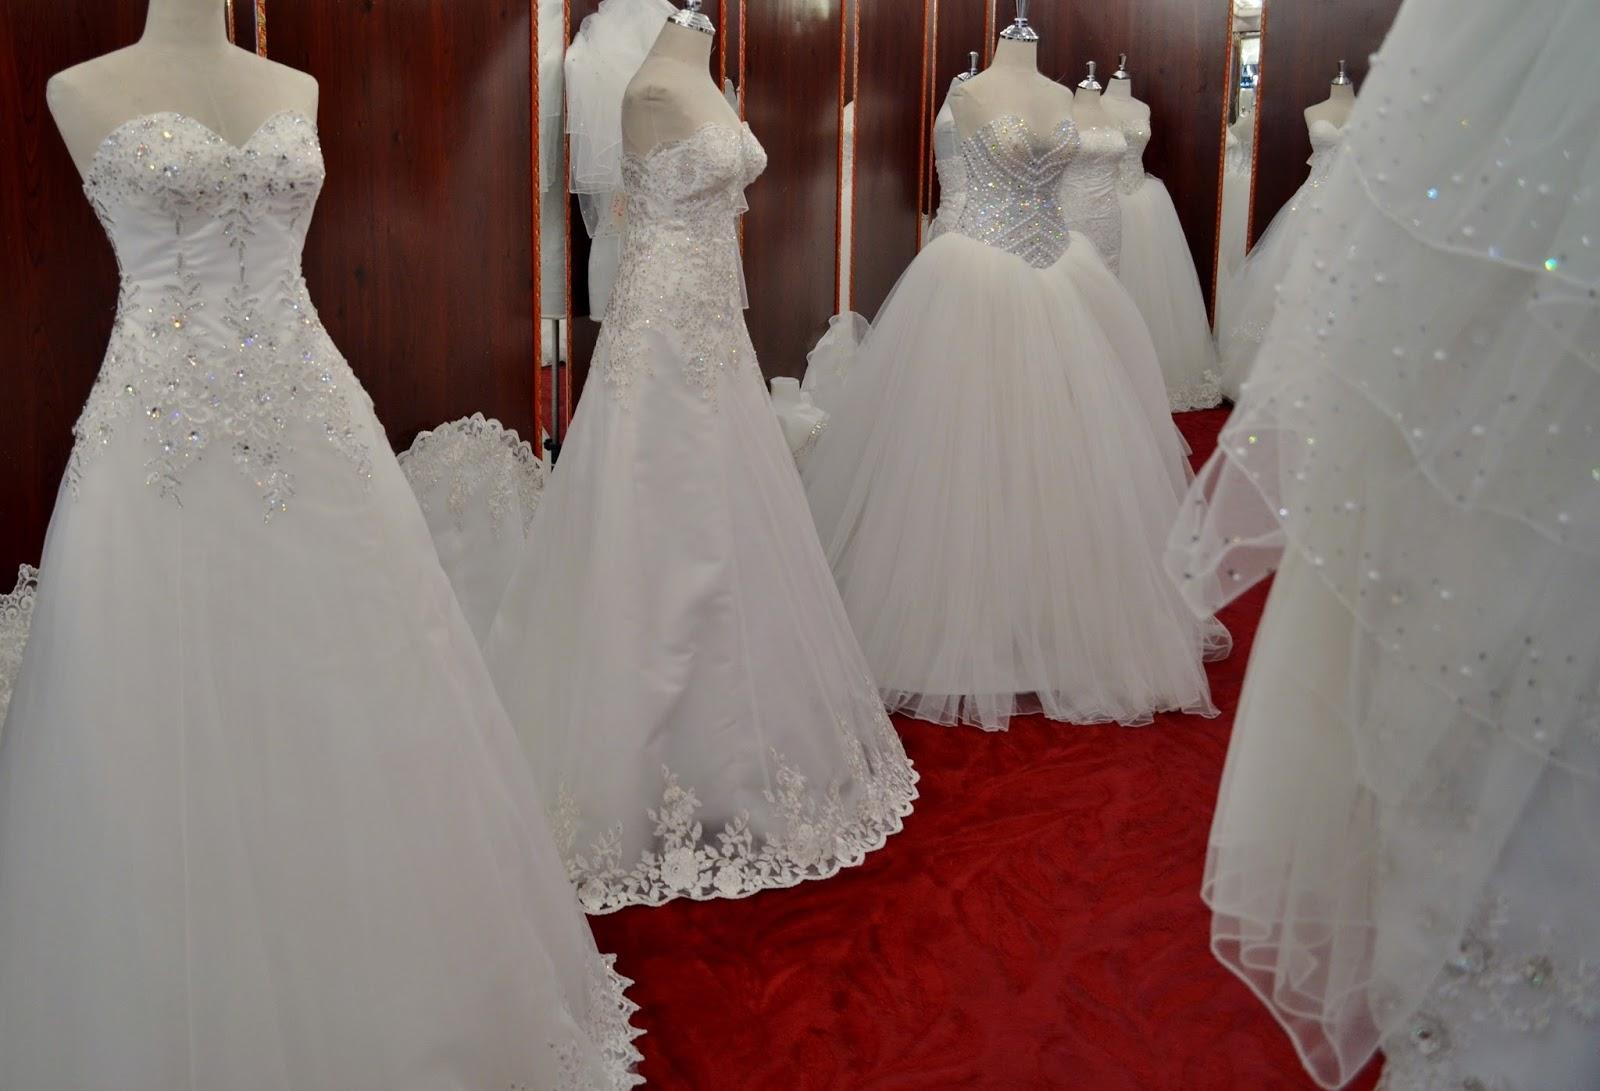 Wedding Souq in Riyadh • Kiwi Living In Saudi